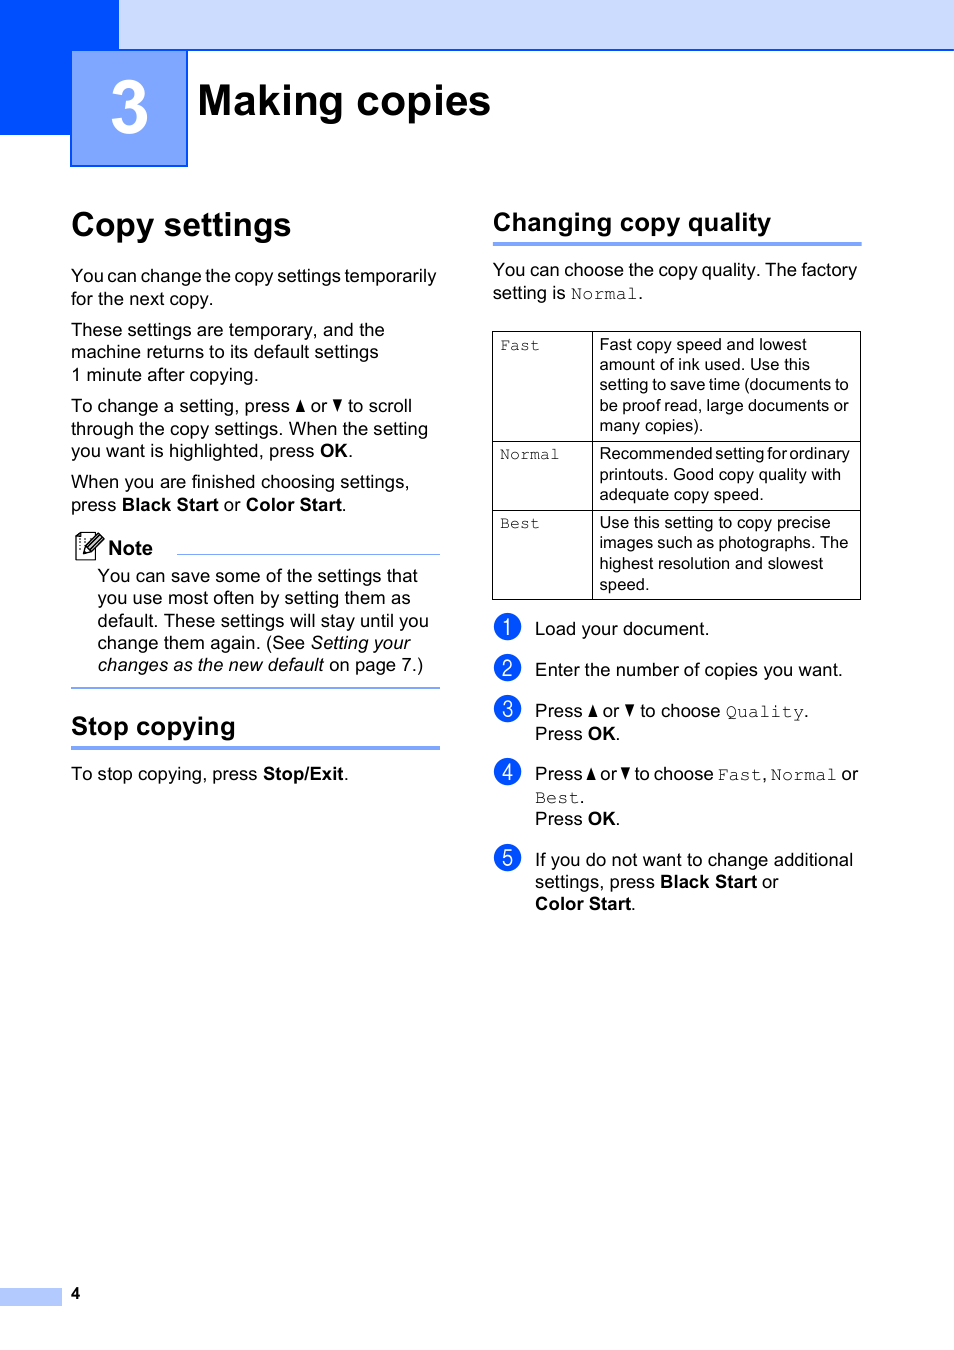 3 making copies copy settings stop copying brother dcp j125 user rh manualsdir com brother dcp j125 service manual manual de impresora brother dcp-j125 en español